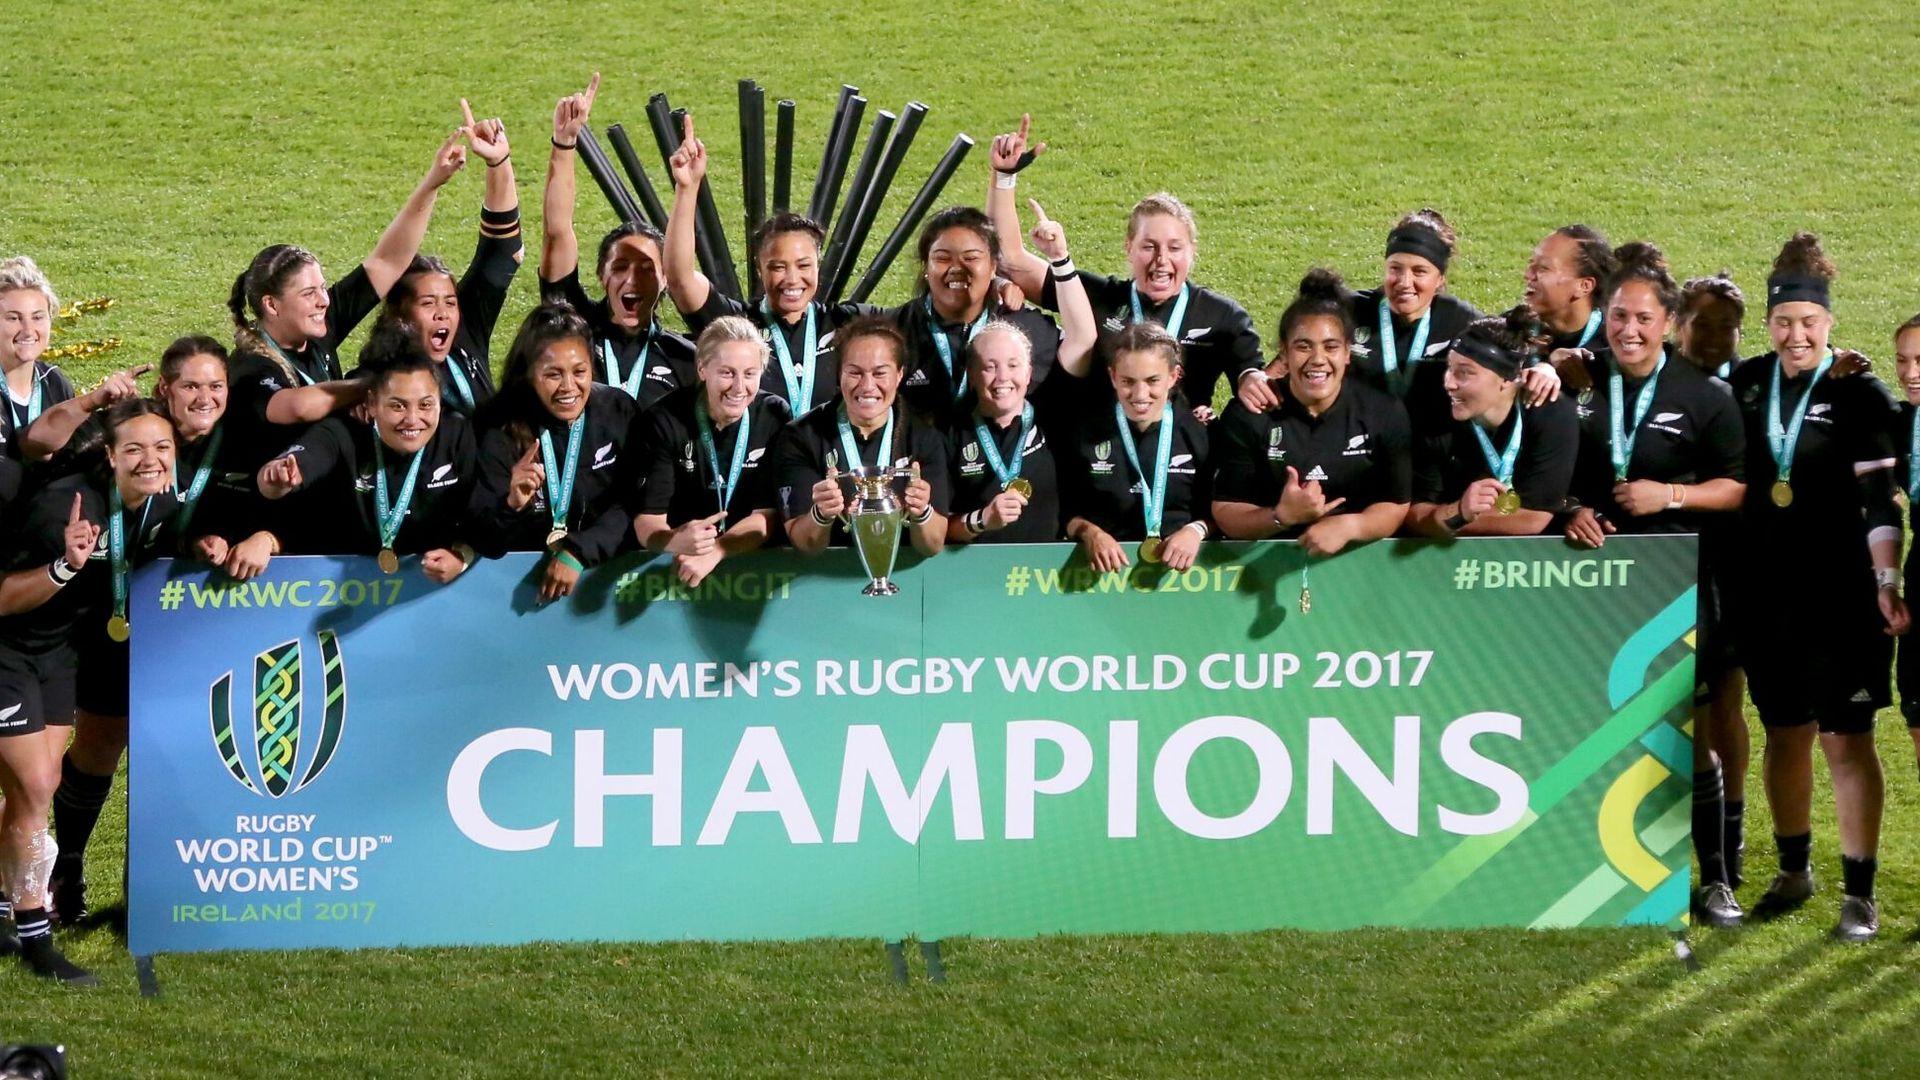 England among top seeds for Women's RWC